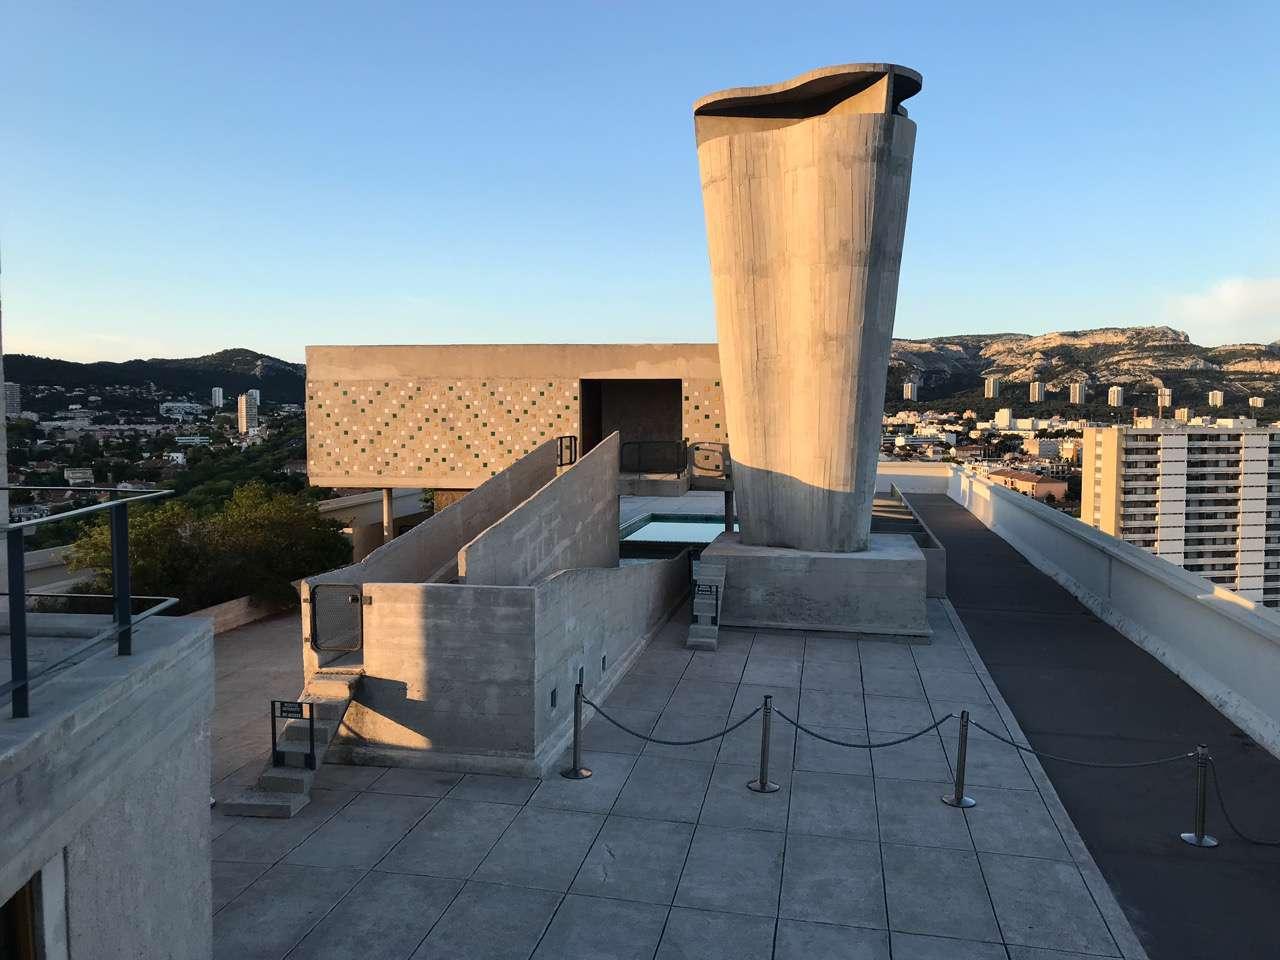 Roof of the Unite d'Habitation